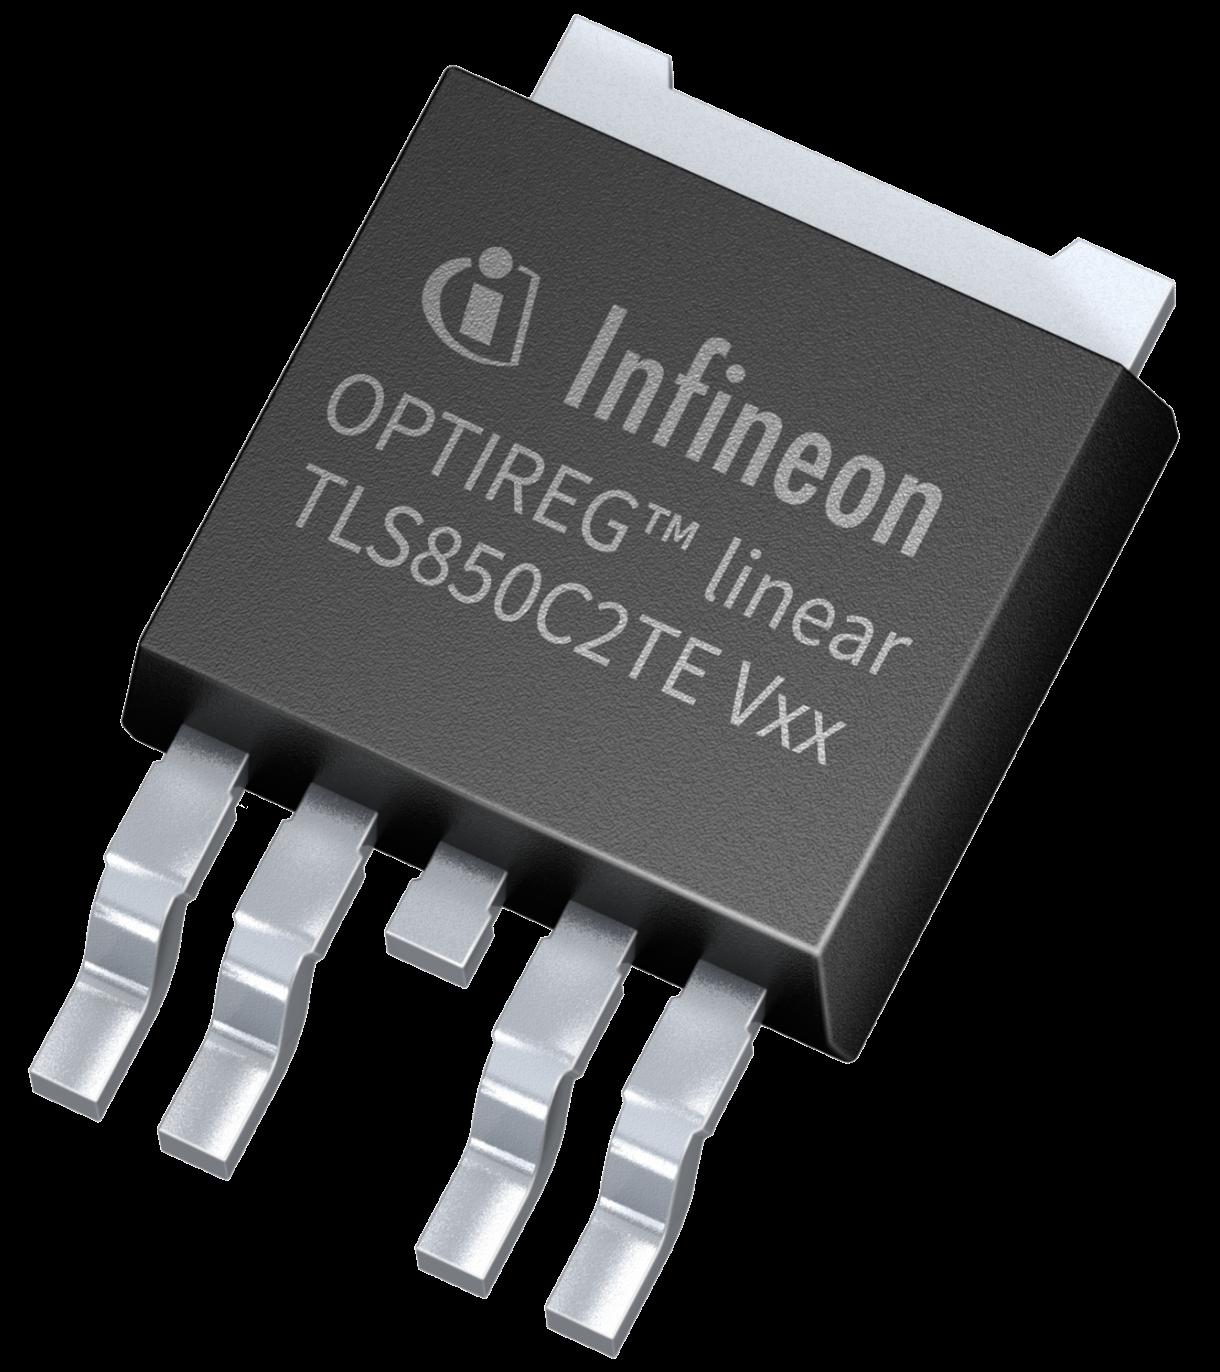 Infineon OPTIREG™ TLS850C2TE V50 & V33 linear voltage regulators